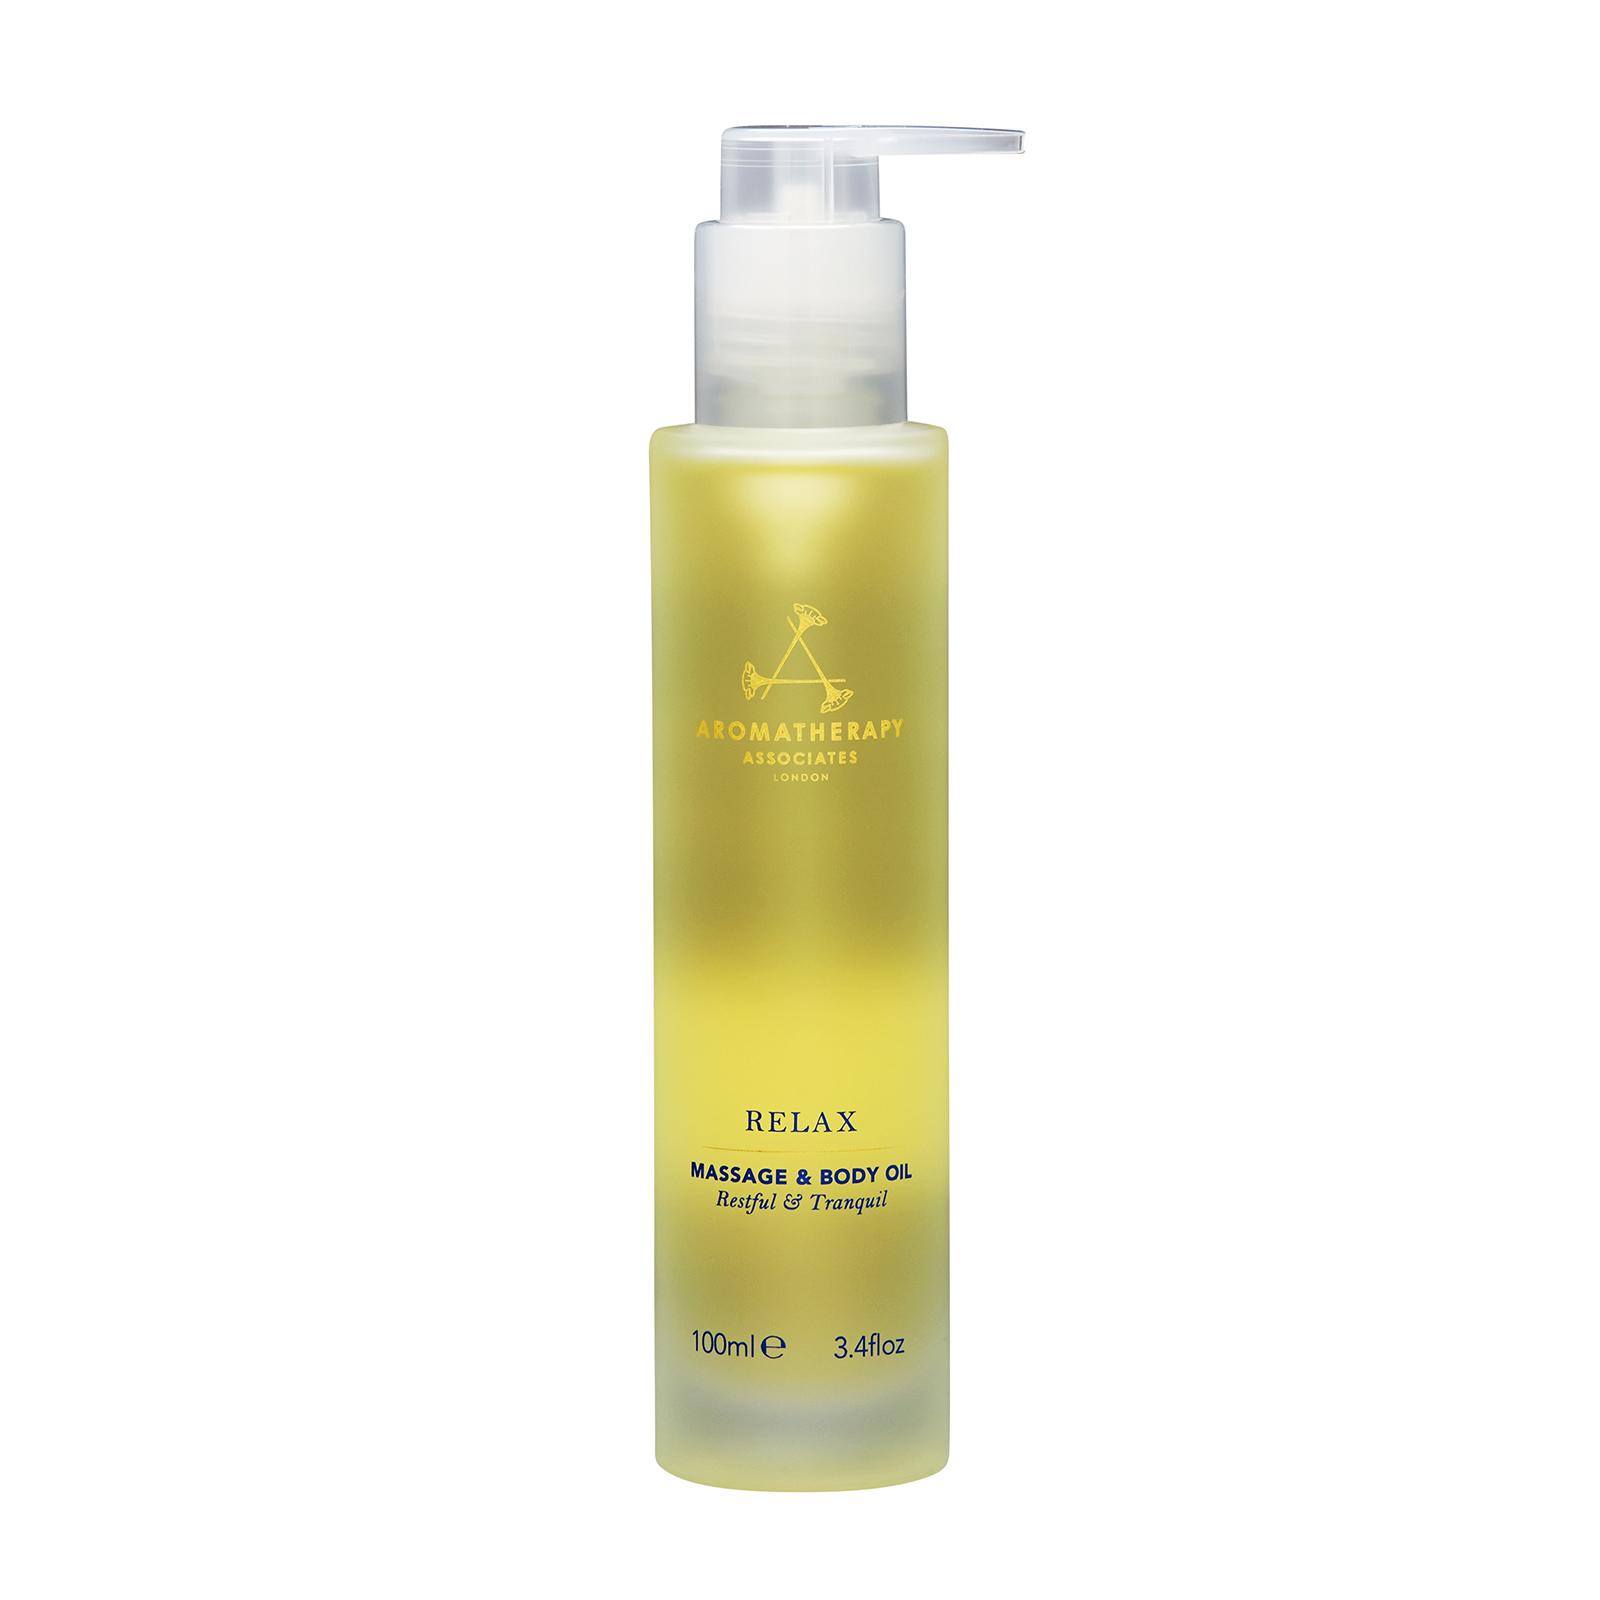 Aromatherapy Associates Relax Massage & Body Oil 3.4oz, 100ml